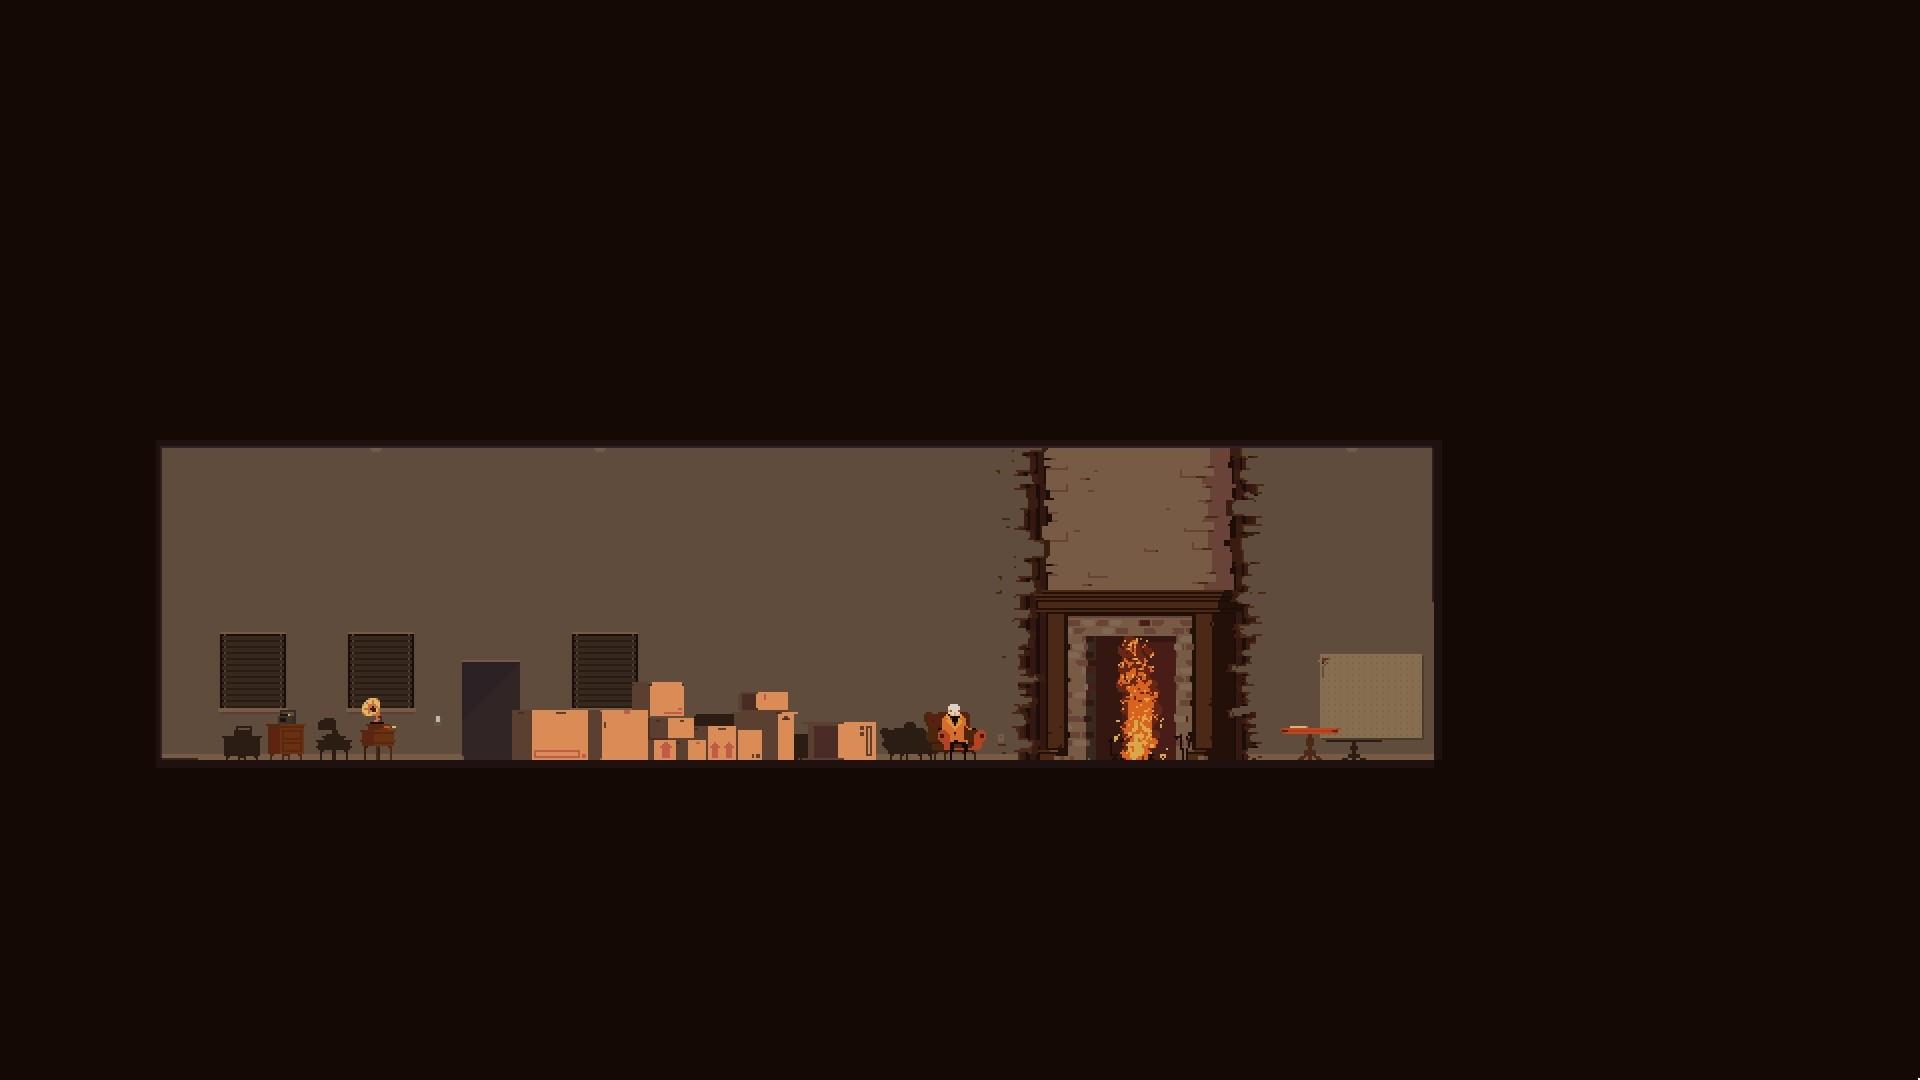 Res: 1920x1080, illustration video games city text symmetry skyline 16 bit 8 bit brand in  games deadbolt hopoo. Wallpaper illustration ...